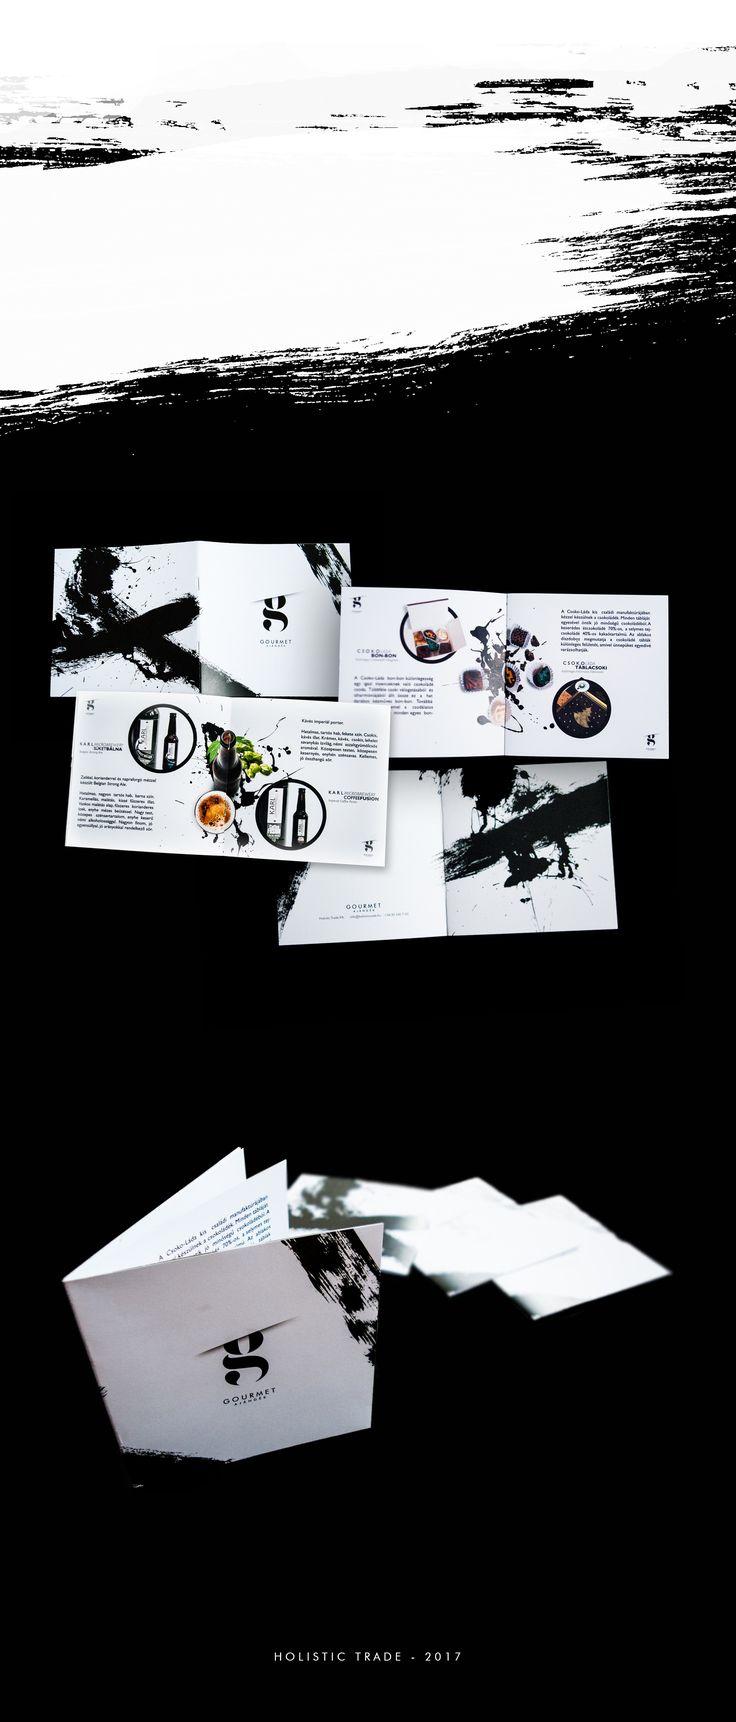 "Check out my @Behance project: ""GOURMET AJÁNDÉK - 2017 Gift brochure"" https://www.behance.net/gallery/60879275/GOURMET-AJANDEK-2017-Gift-brochure"